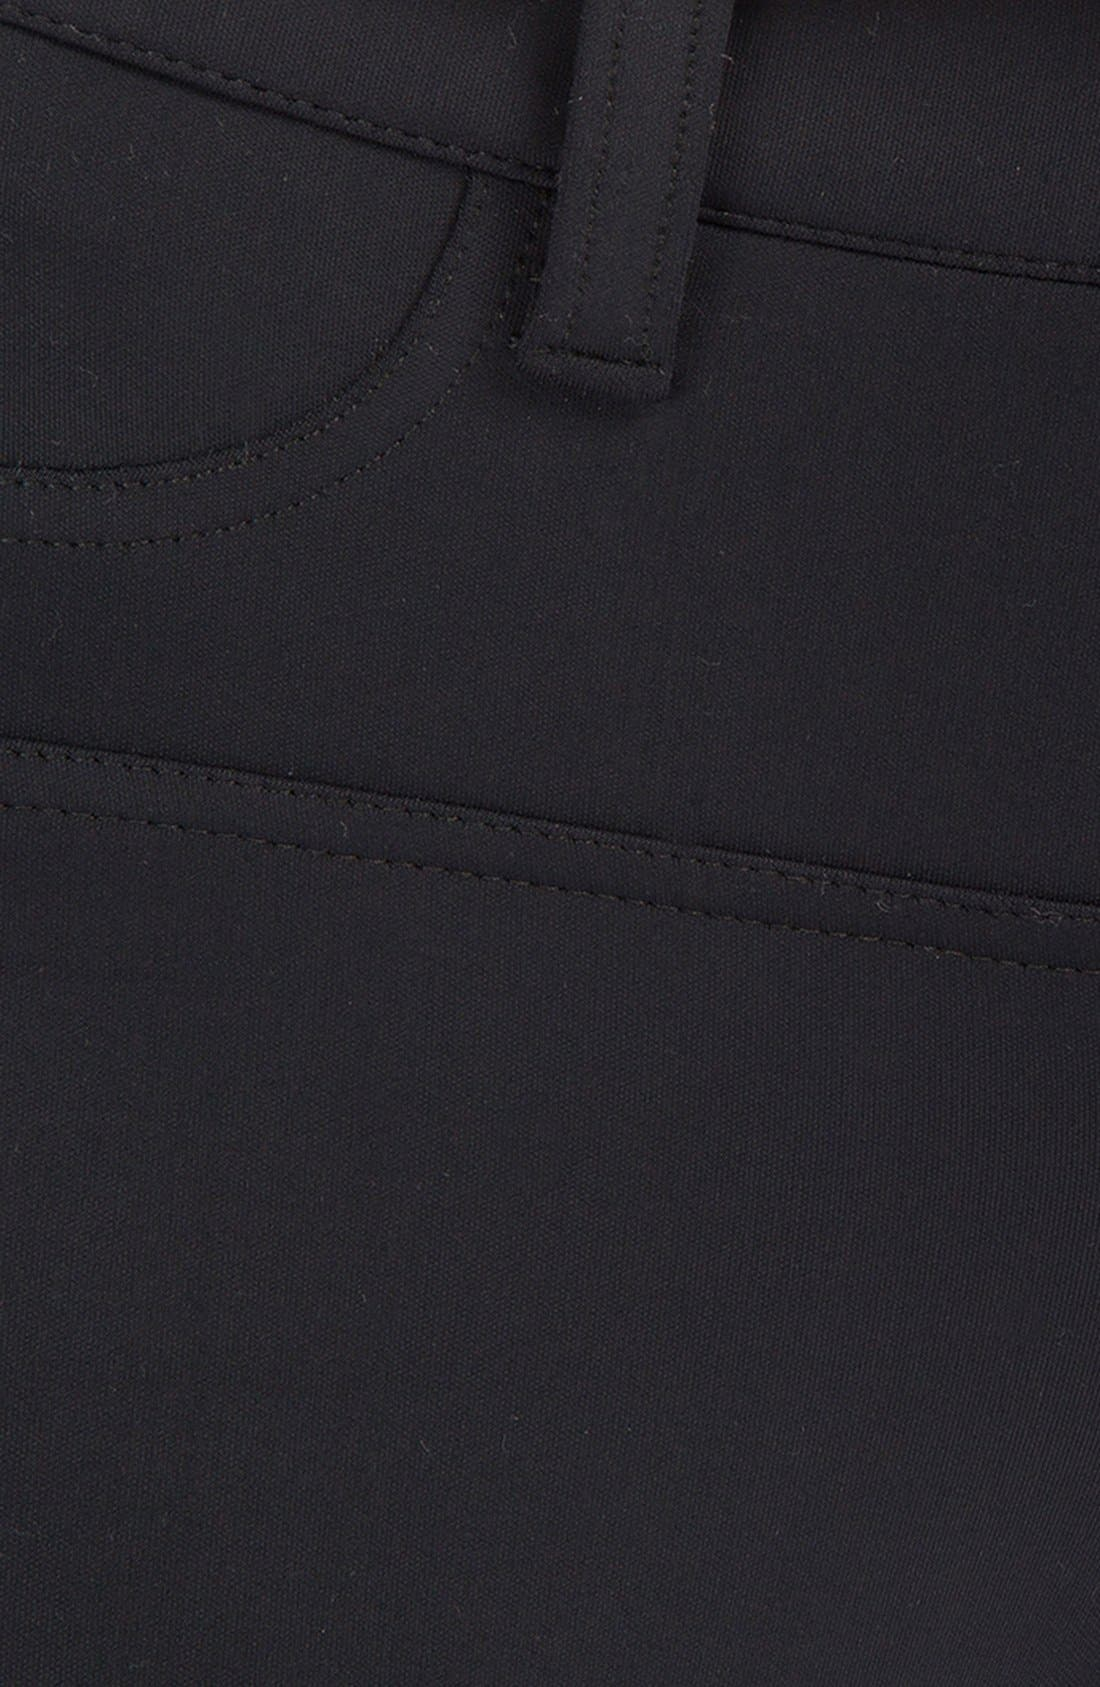 Alternate Image 3  - maje 'Duc' Knit Pants